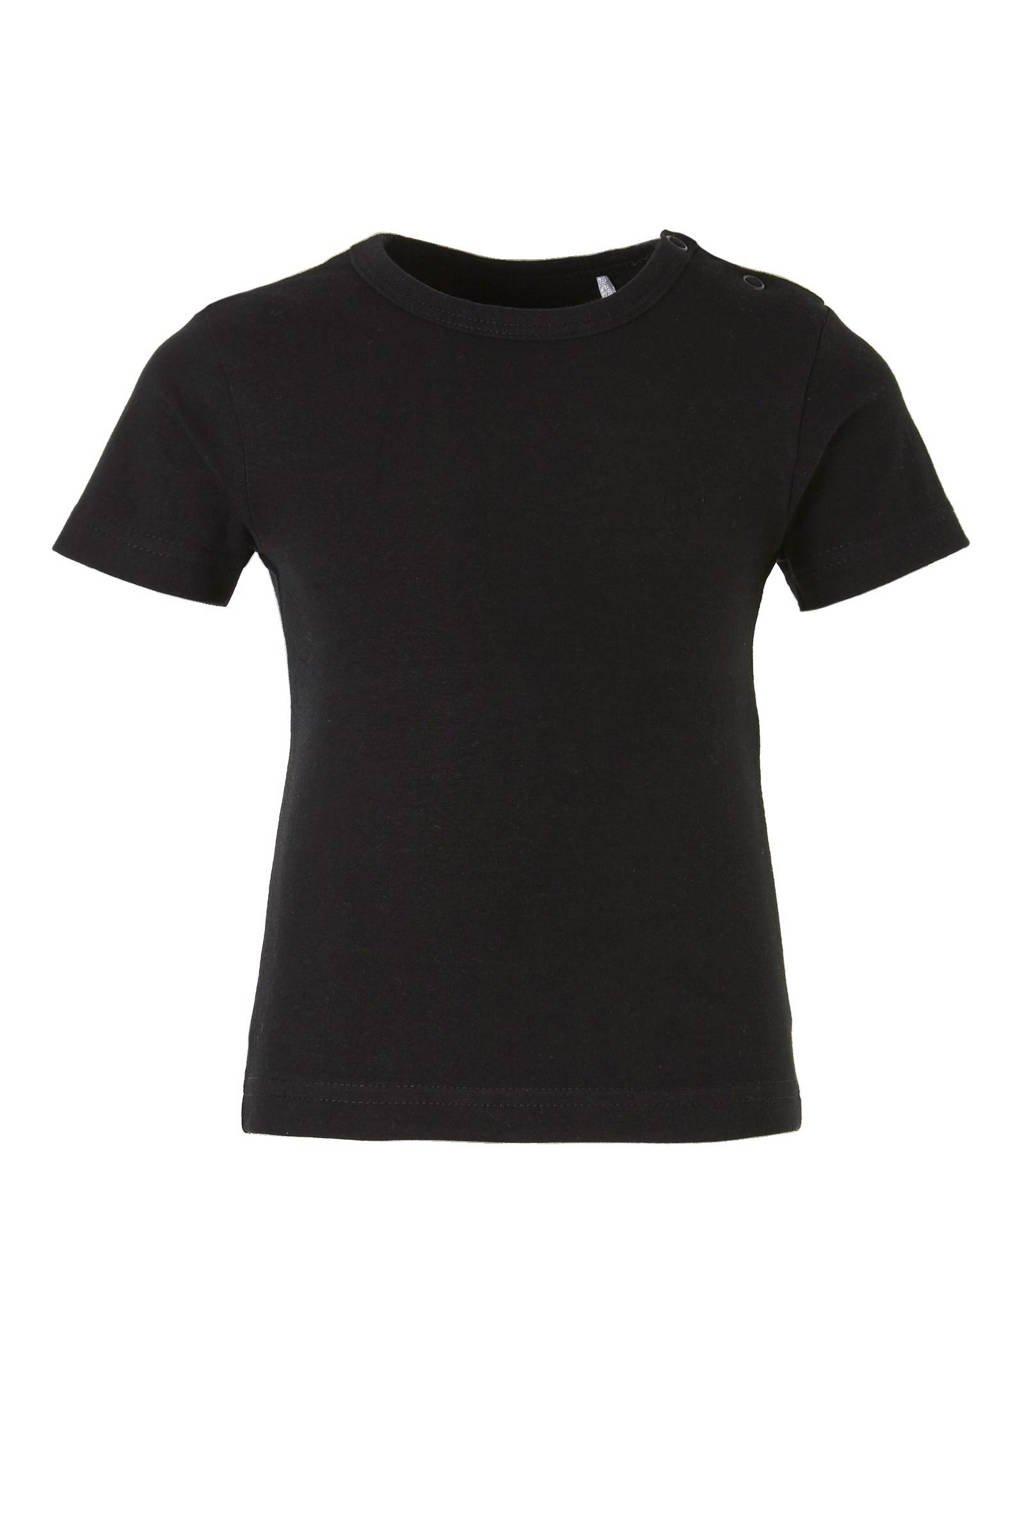 Dirkje T-shirt zwart, Zwart, Korte mouw